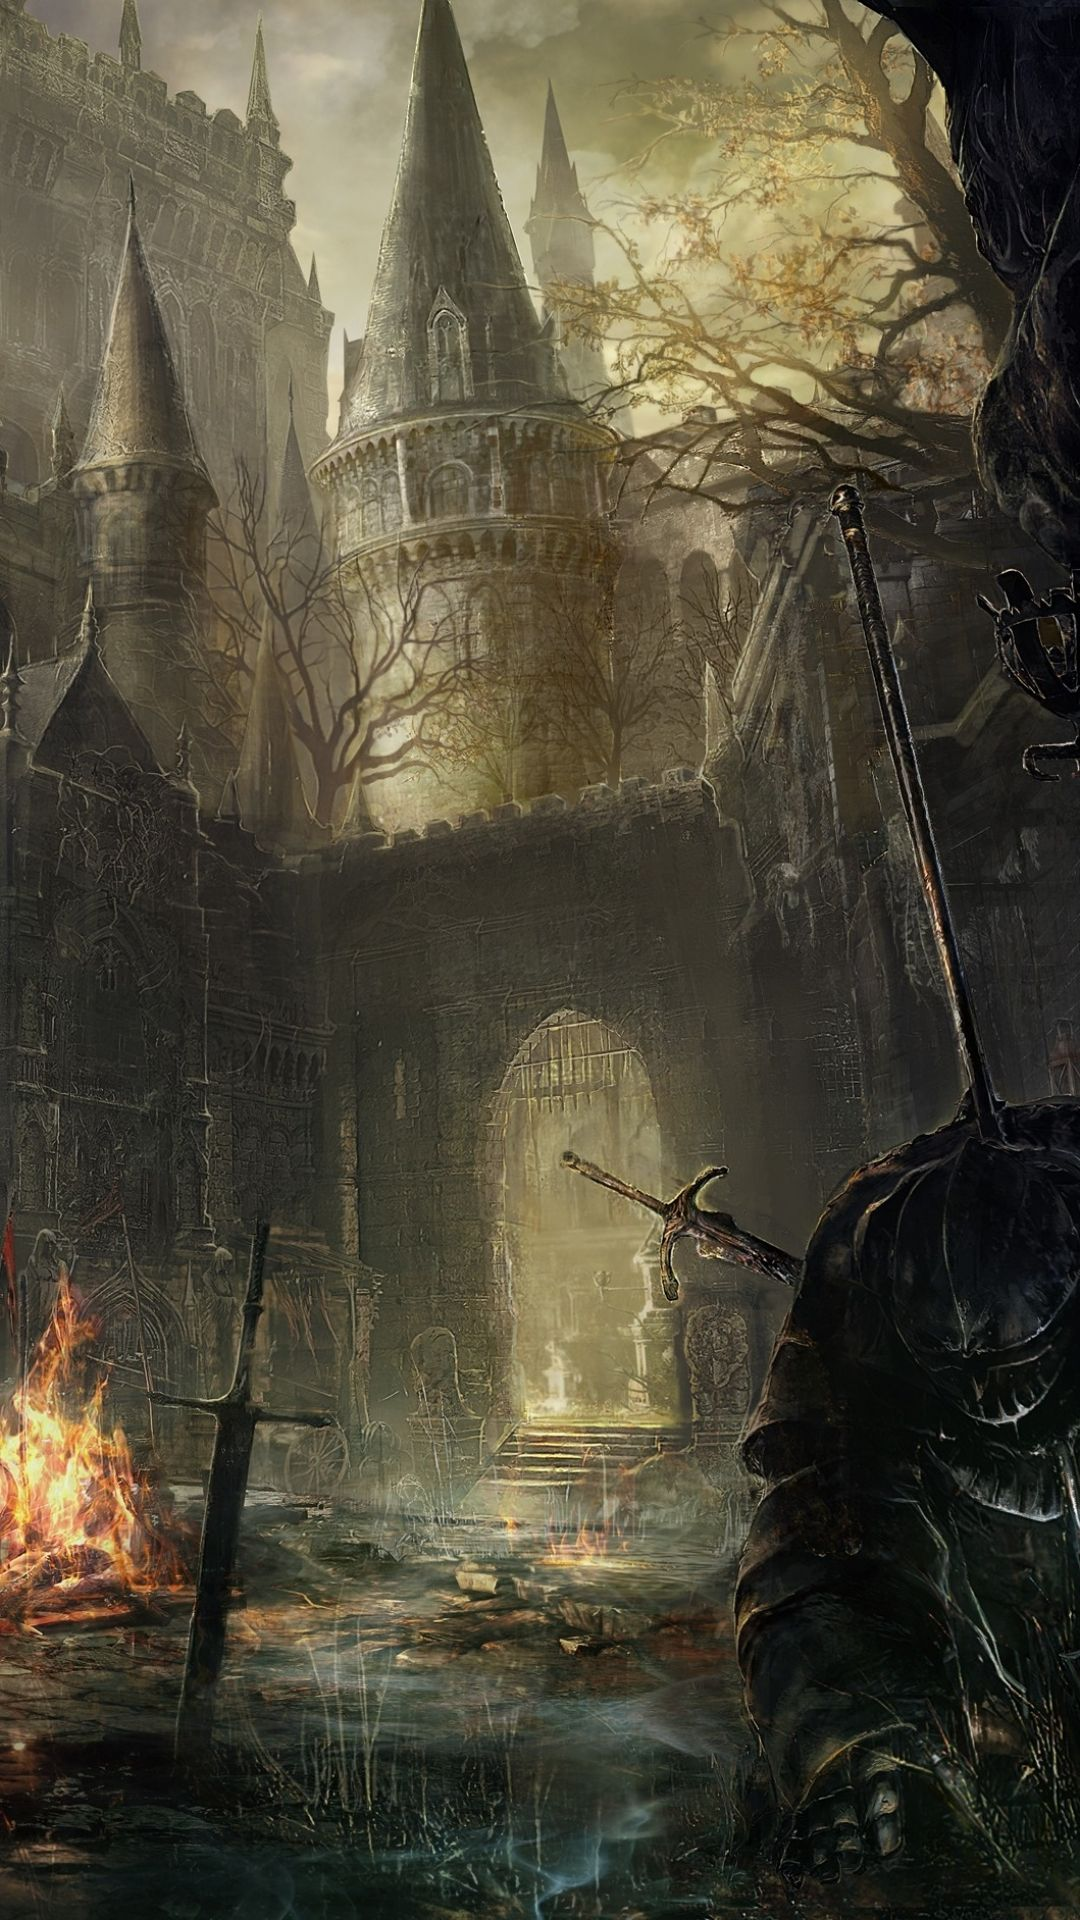 Dark Souls Iphone 5 Wallpapers Top Free Dark Souls Iphone 5